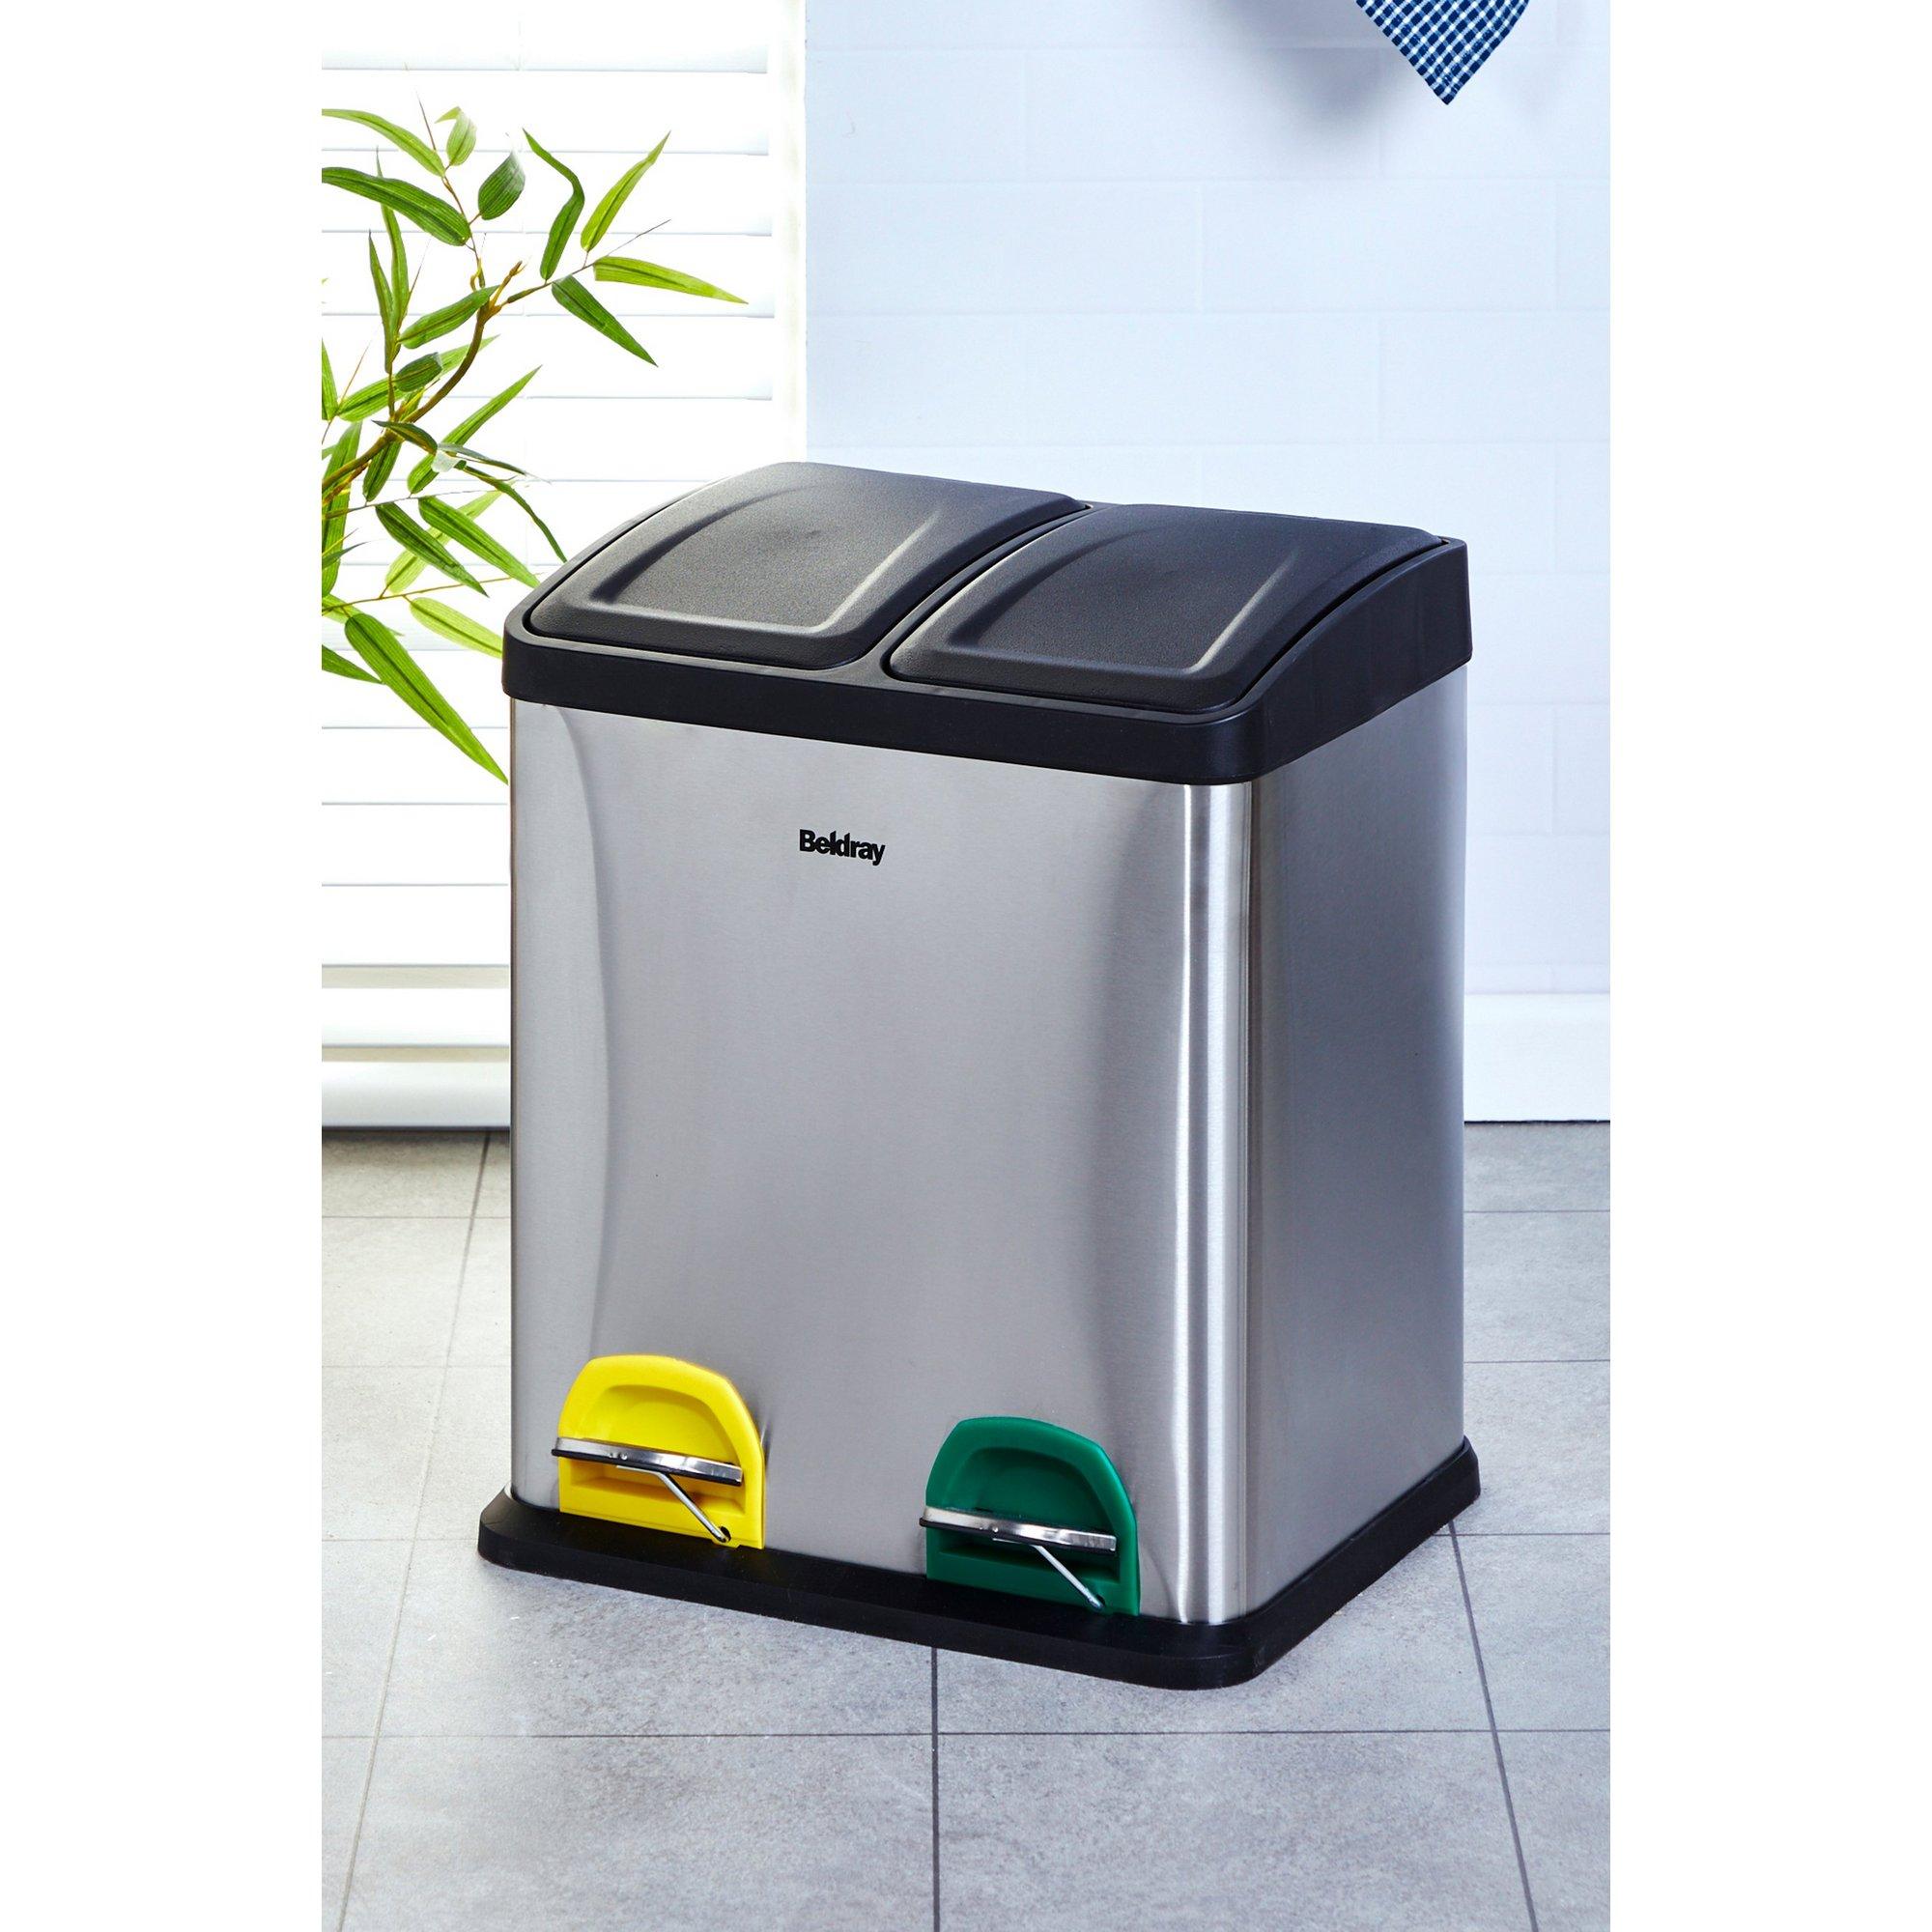 Image of Beldray Recycle Bin